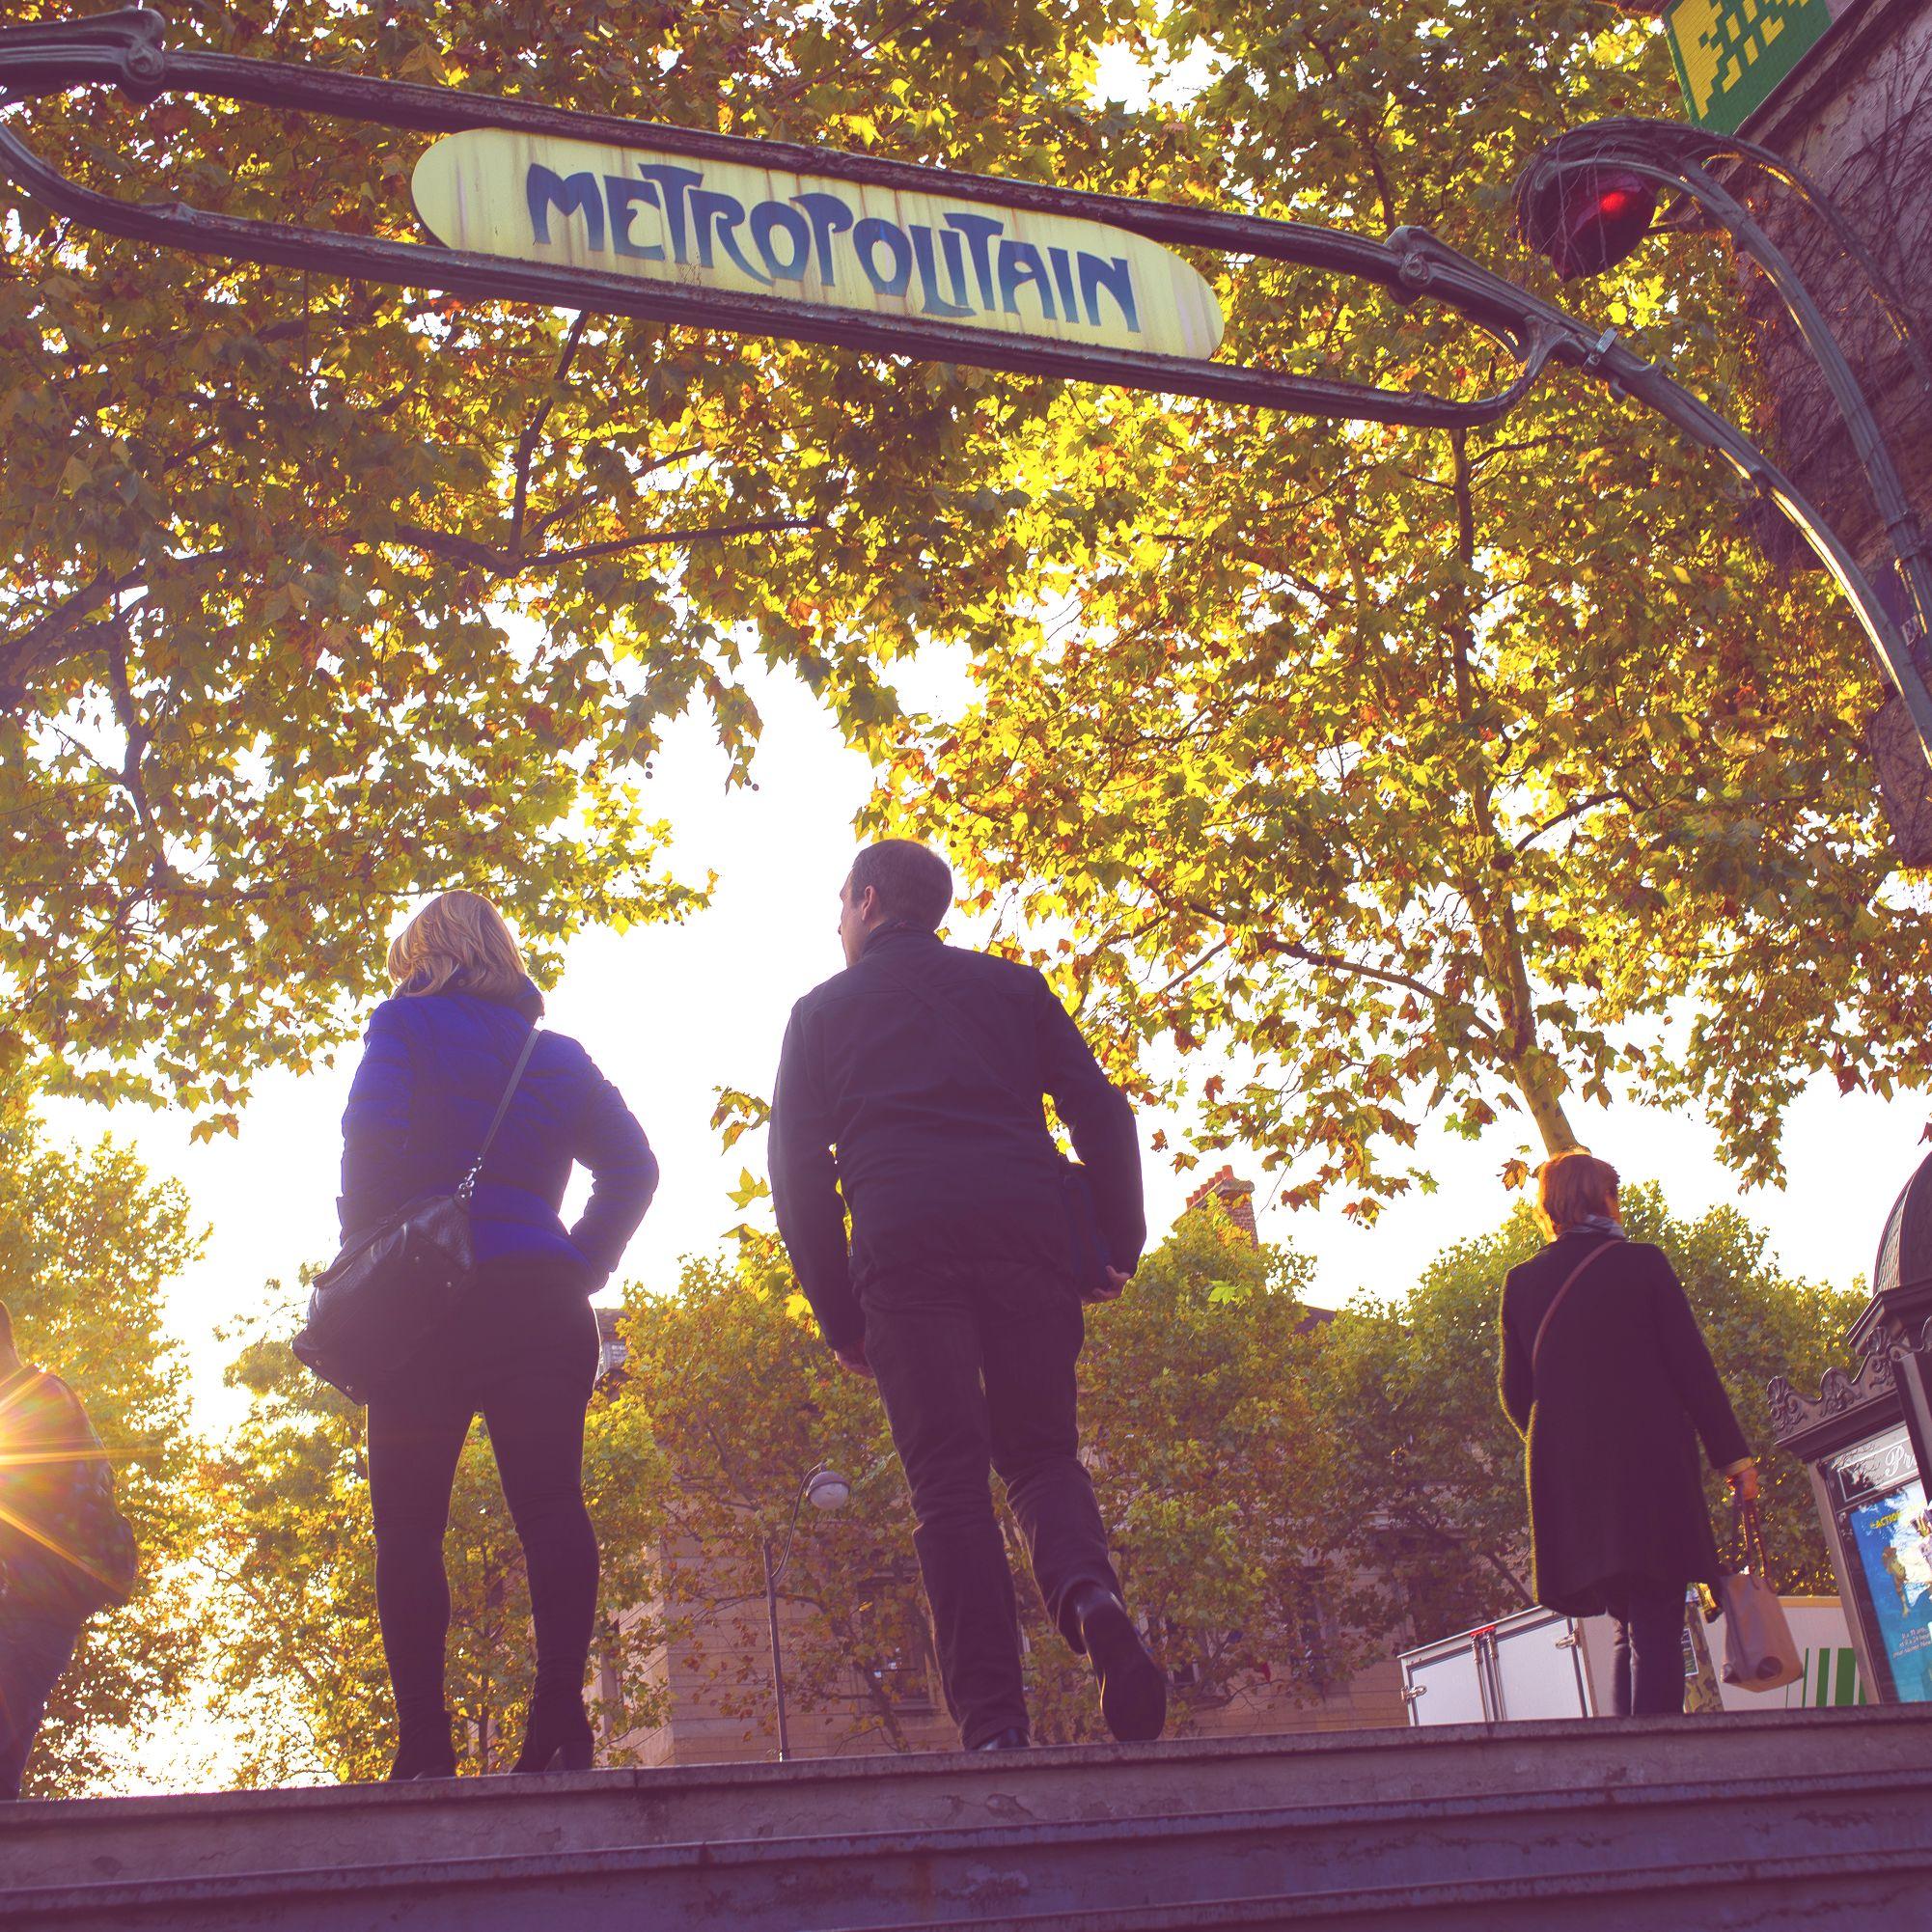 Métropolitain: For Authenticity, Go to Ground in Paris